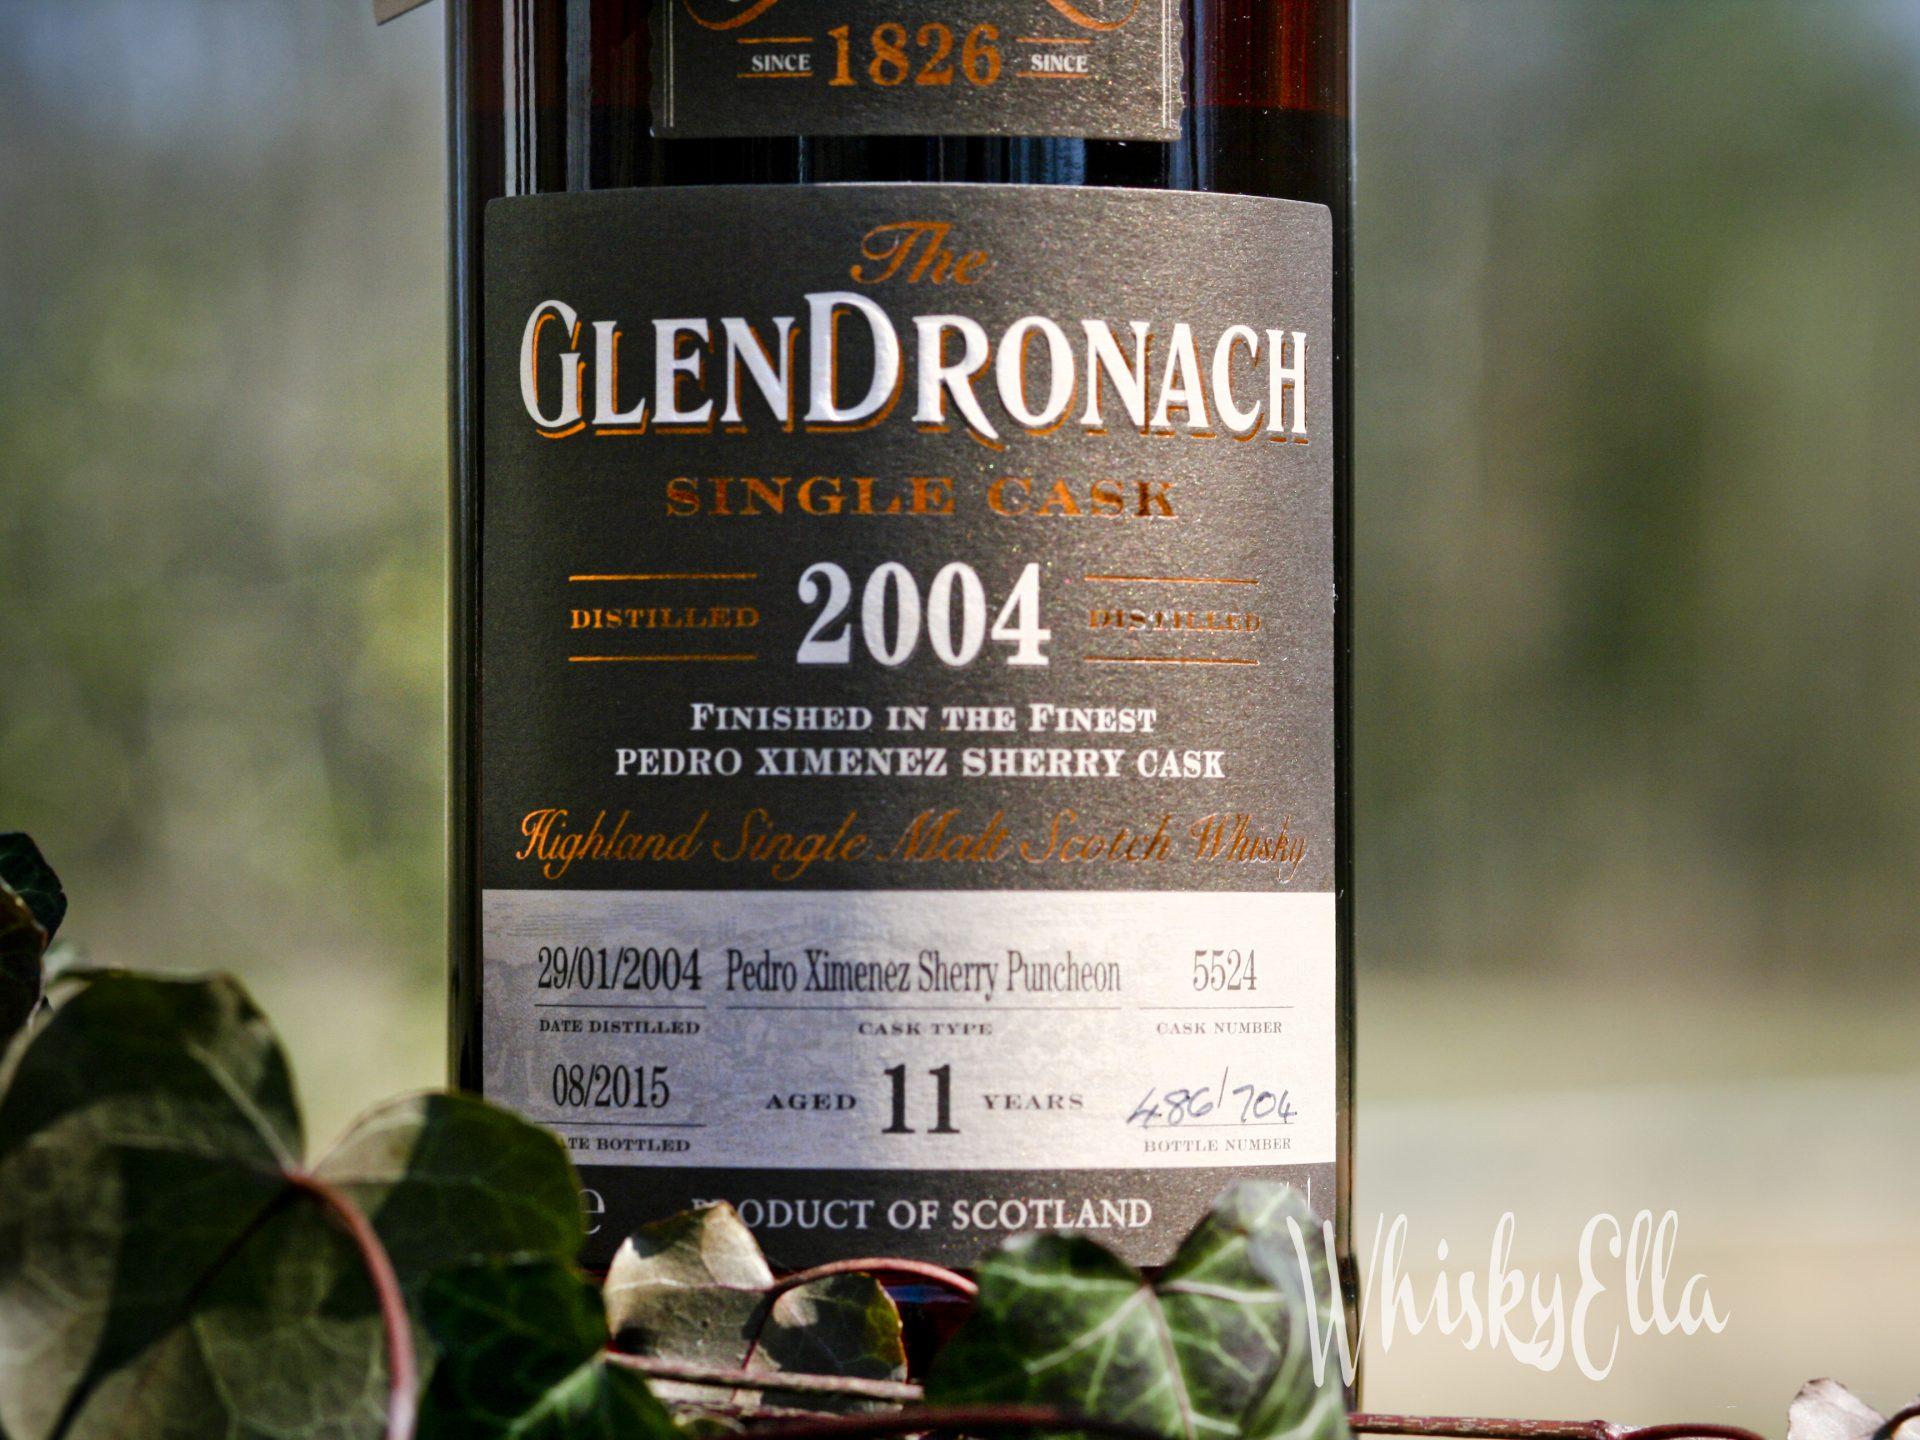 Nasza recenzja GlenDronach Single Cask 2004 11 yo Pedro Ximenez Sherry Puncheon, cask numer 5524 #58